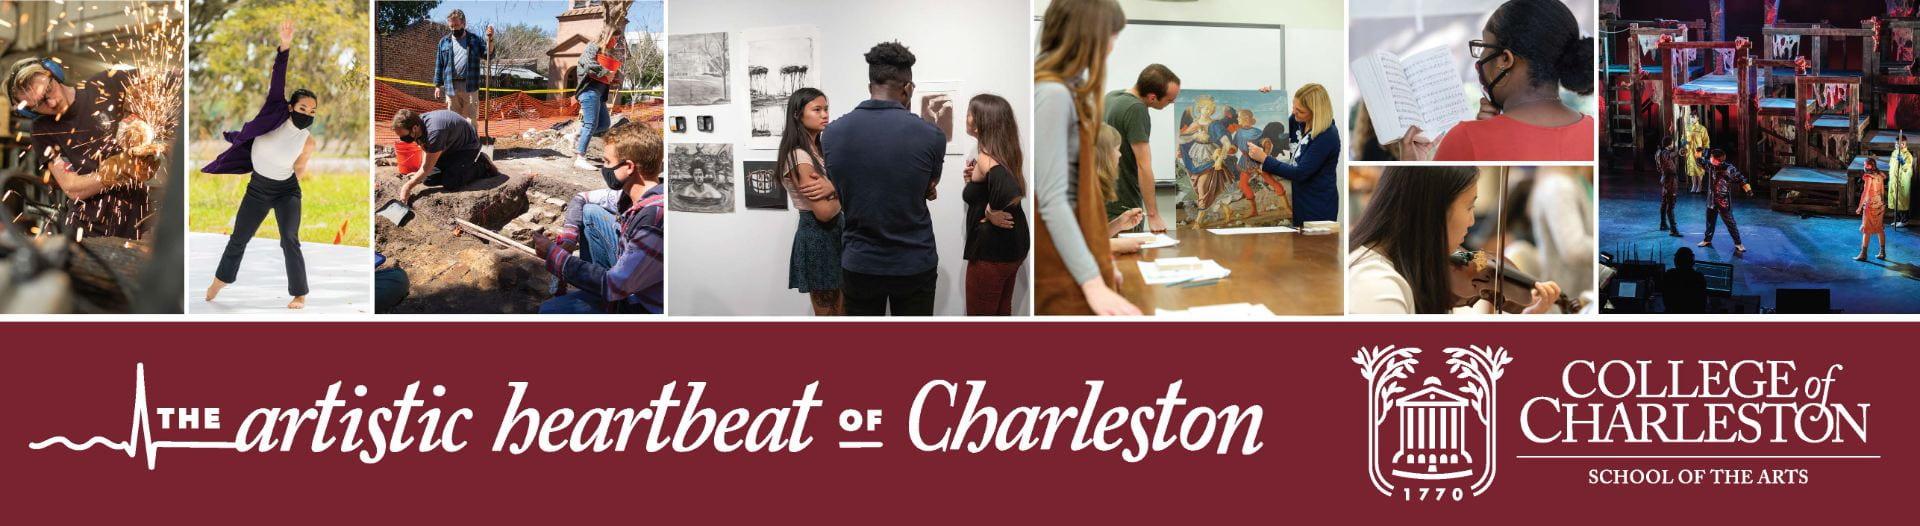 College of Charleston SCHOOL OF THE ARTS